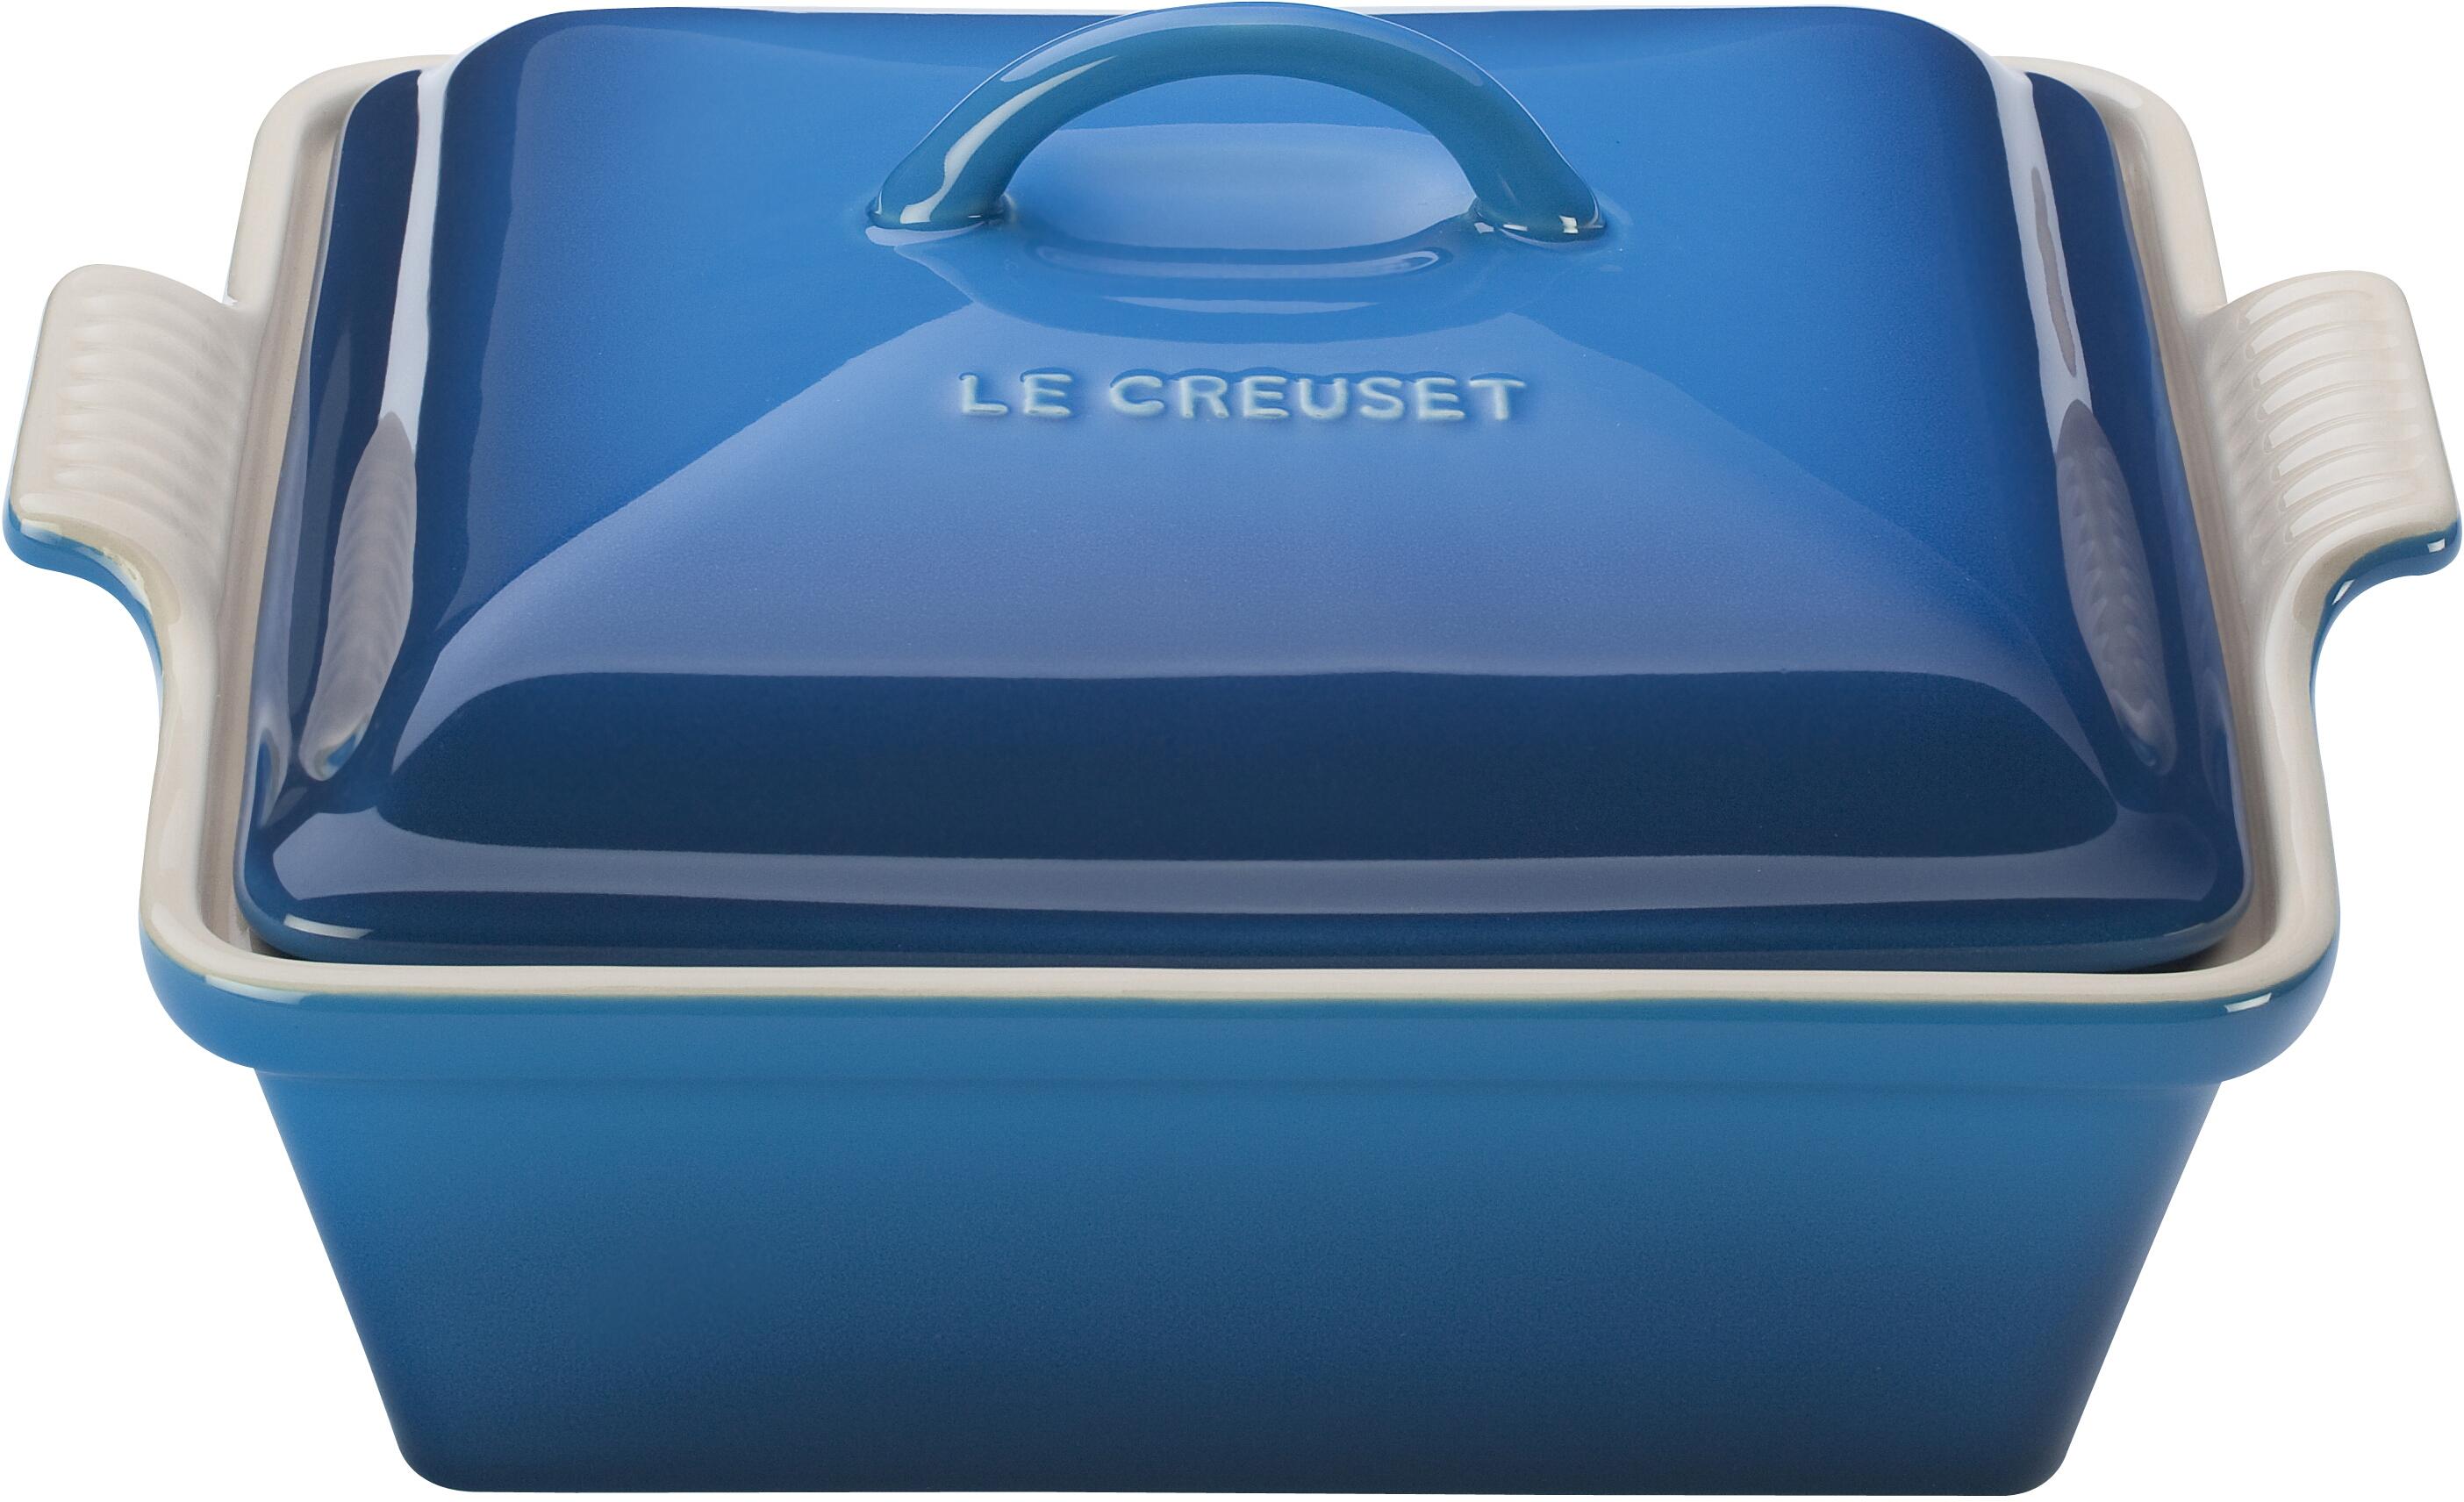 Le Creuset Heritage Marseille Blue Stoneware Covered Square Casserole Dish, 2.5 Quart